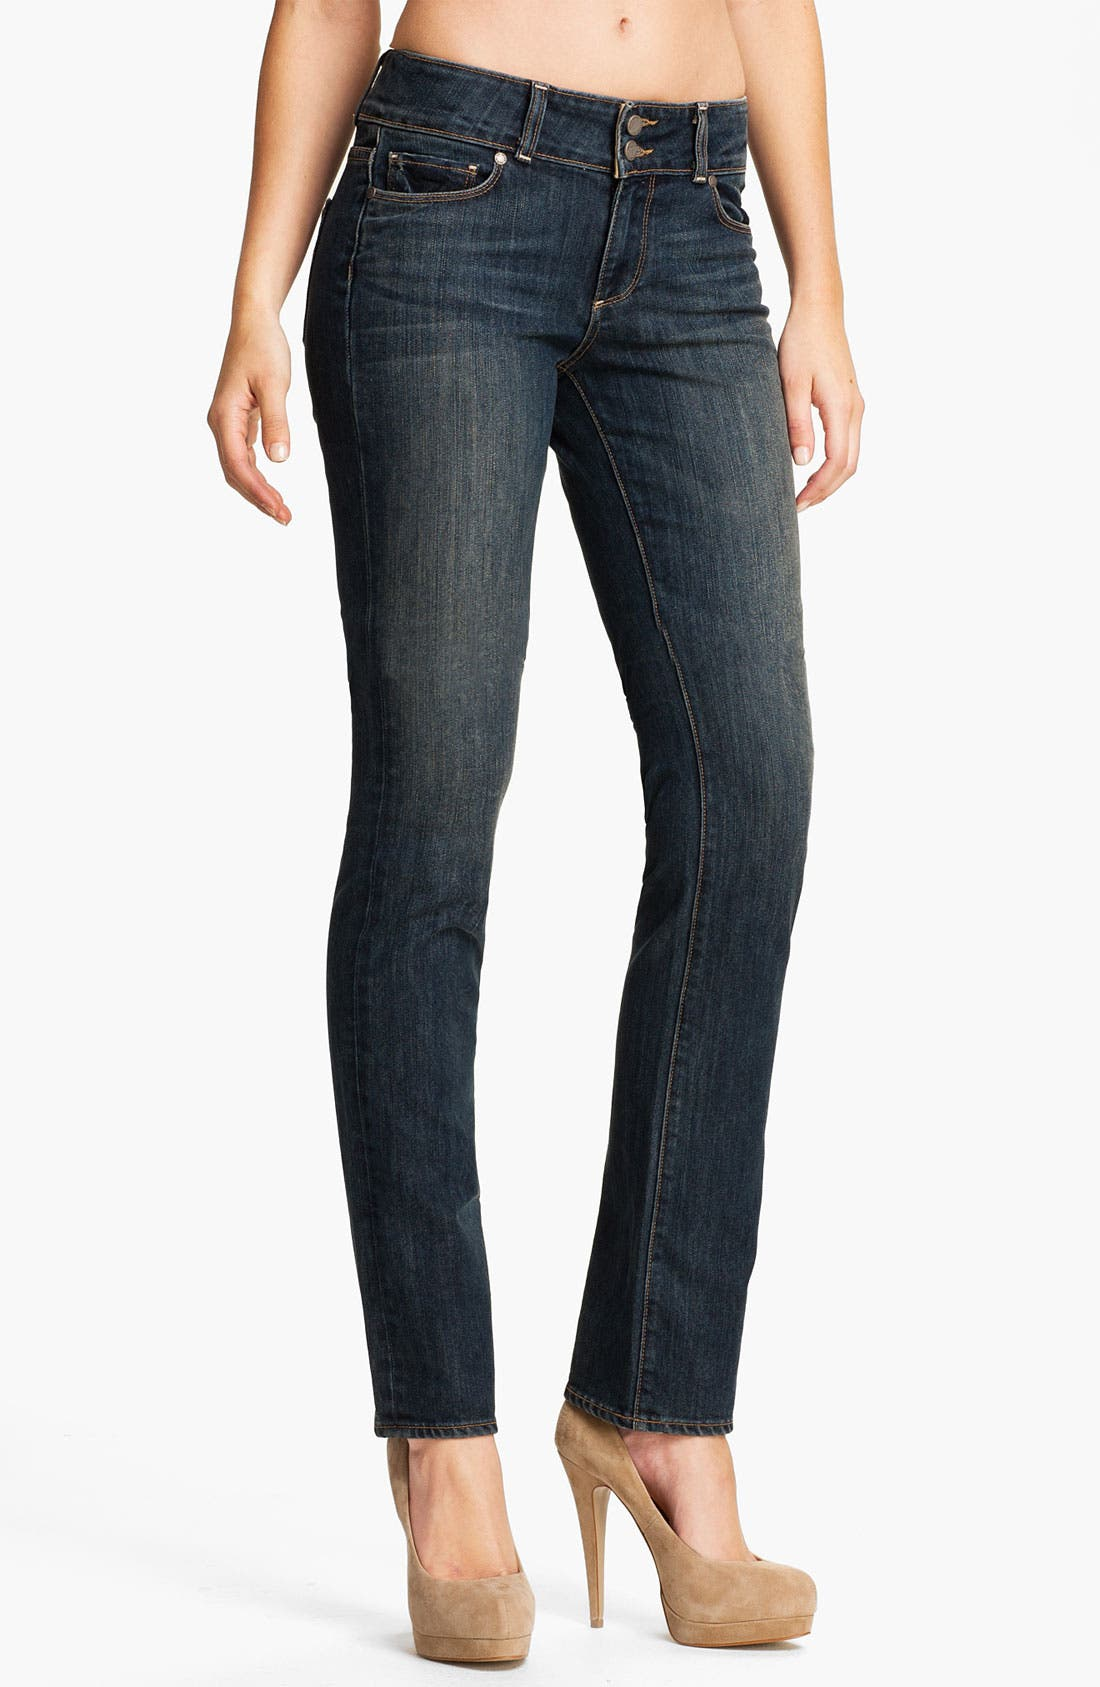 Alternate Image 1 Selected - Paige Denim 'Hidden Hills' Straight Leg Stretch Jeans (Cottonwood Creek)